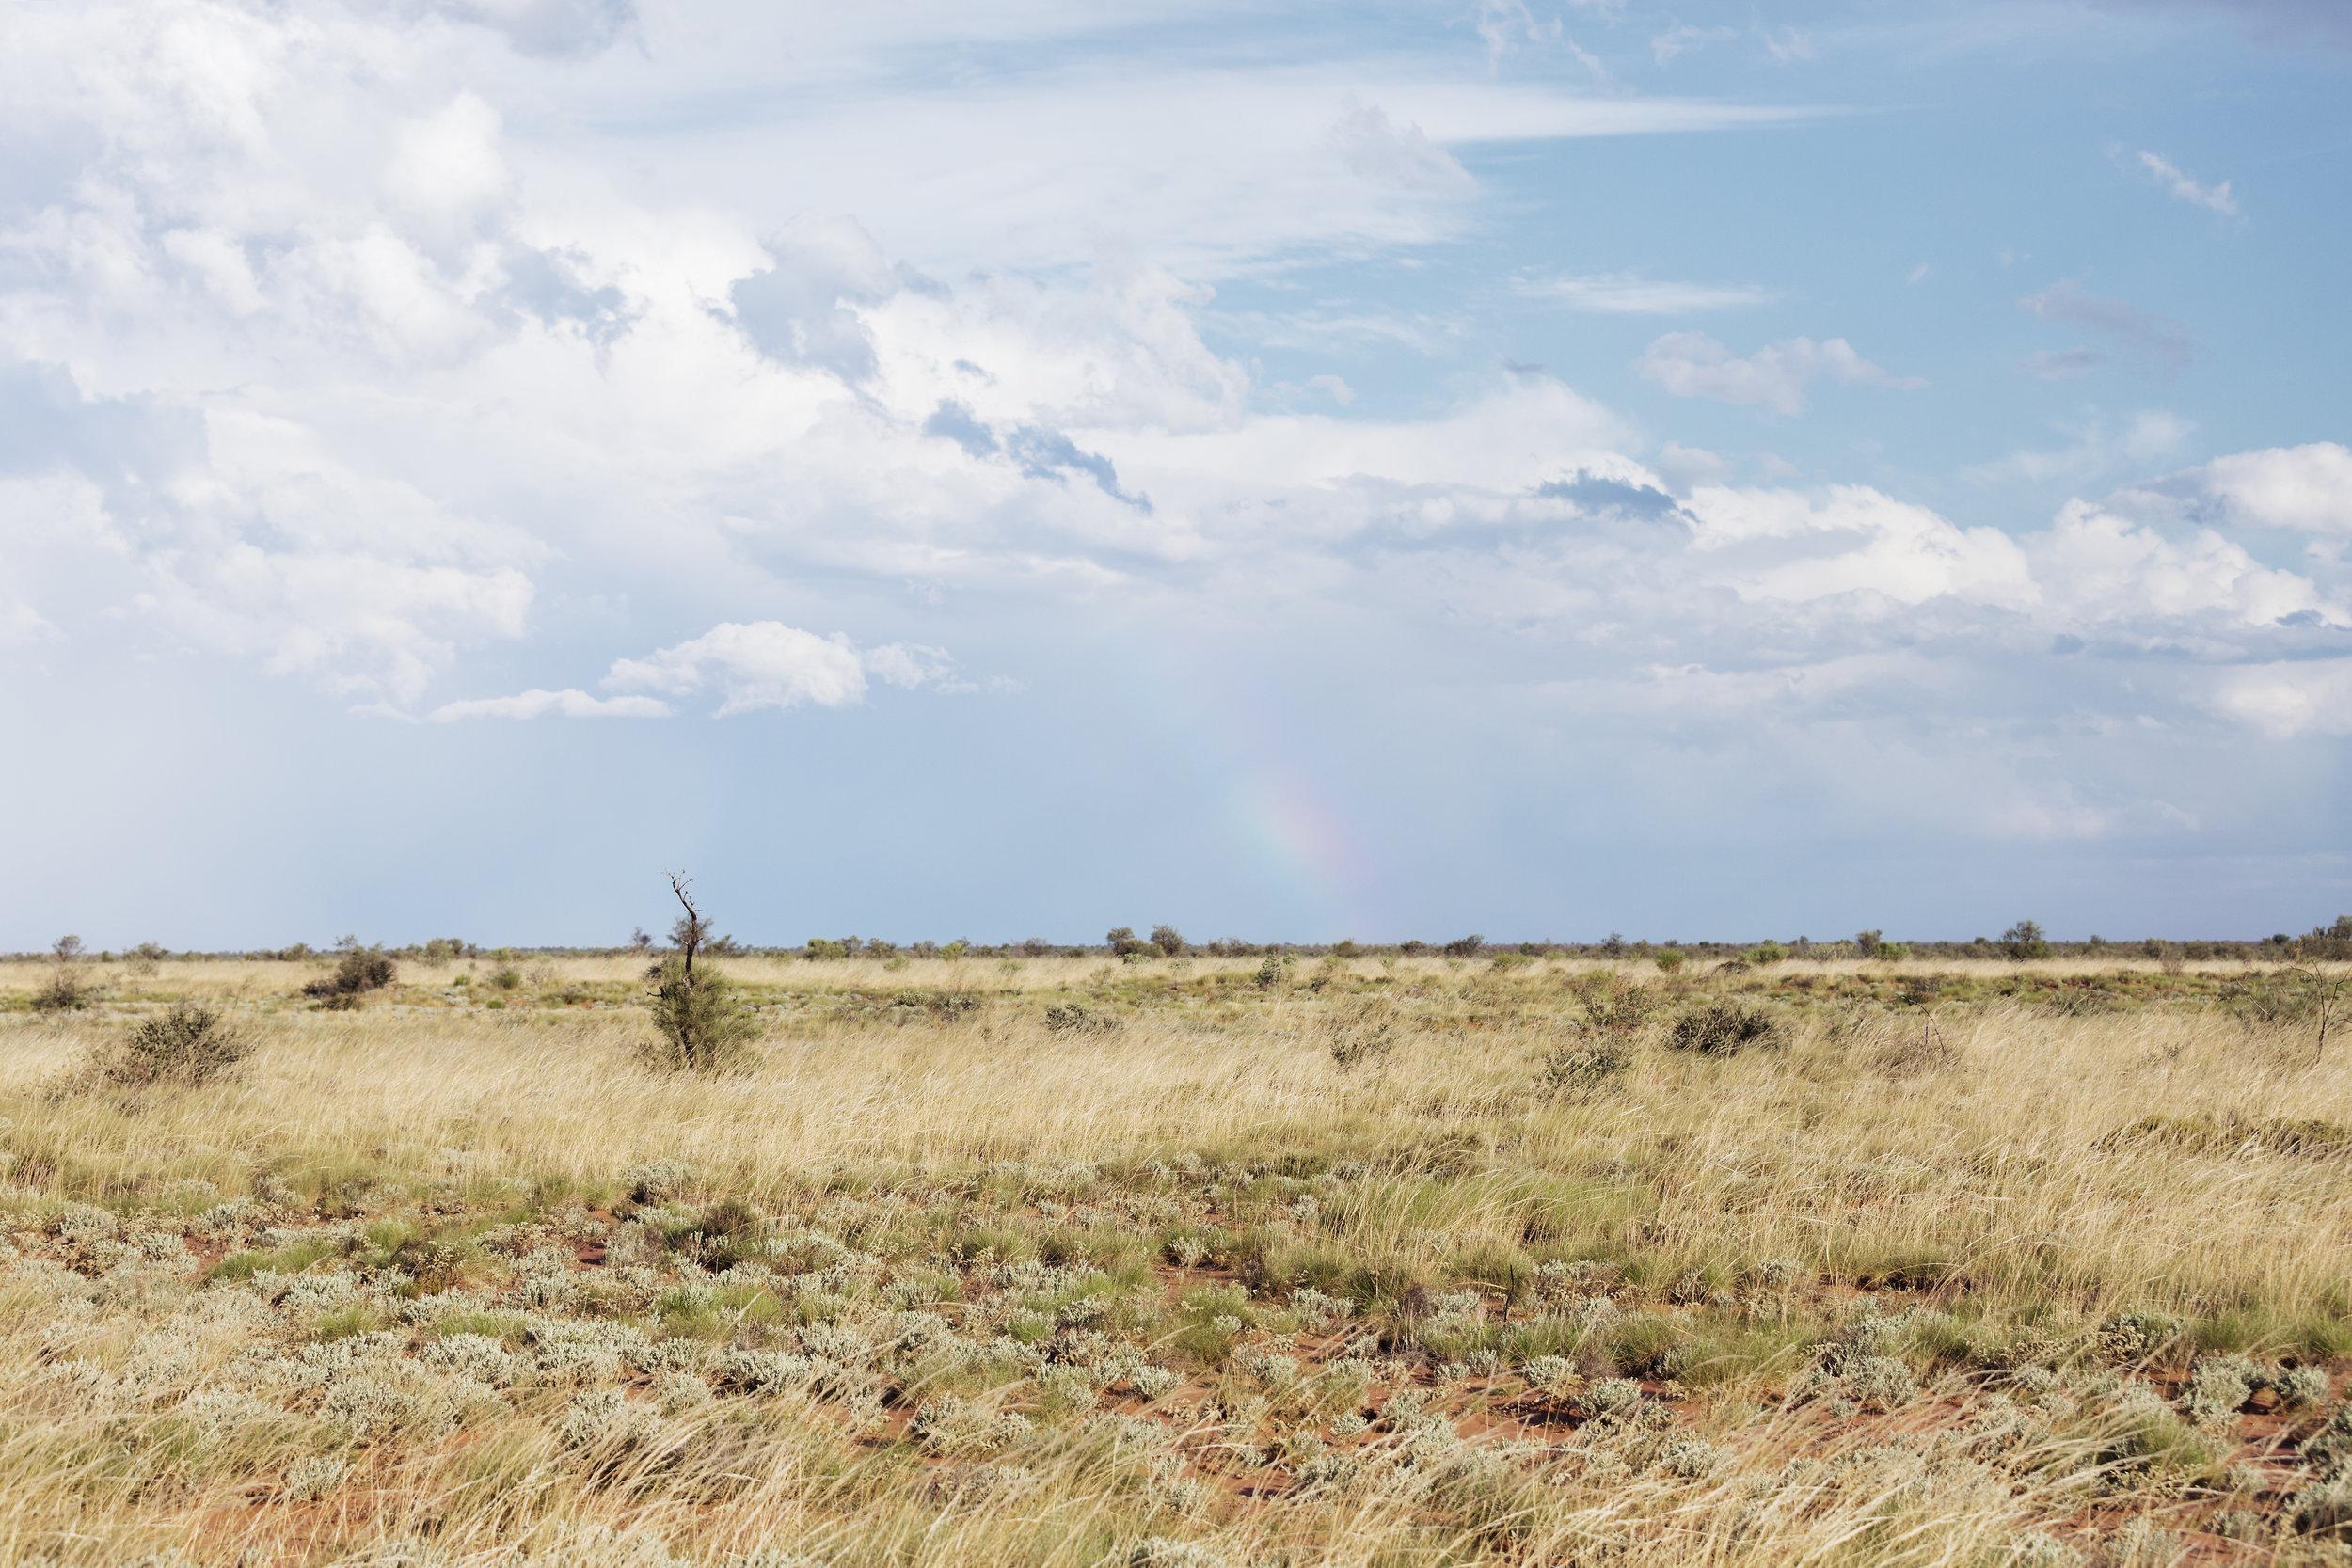 10  Tanami Rainbow      -19.906674, 129.440811     Tanami Desert, Warlpiri country, NT,2016